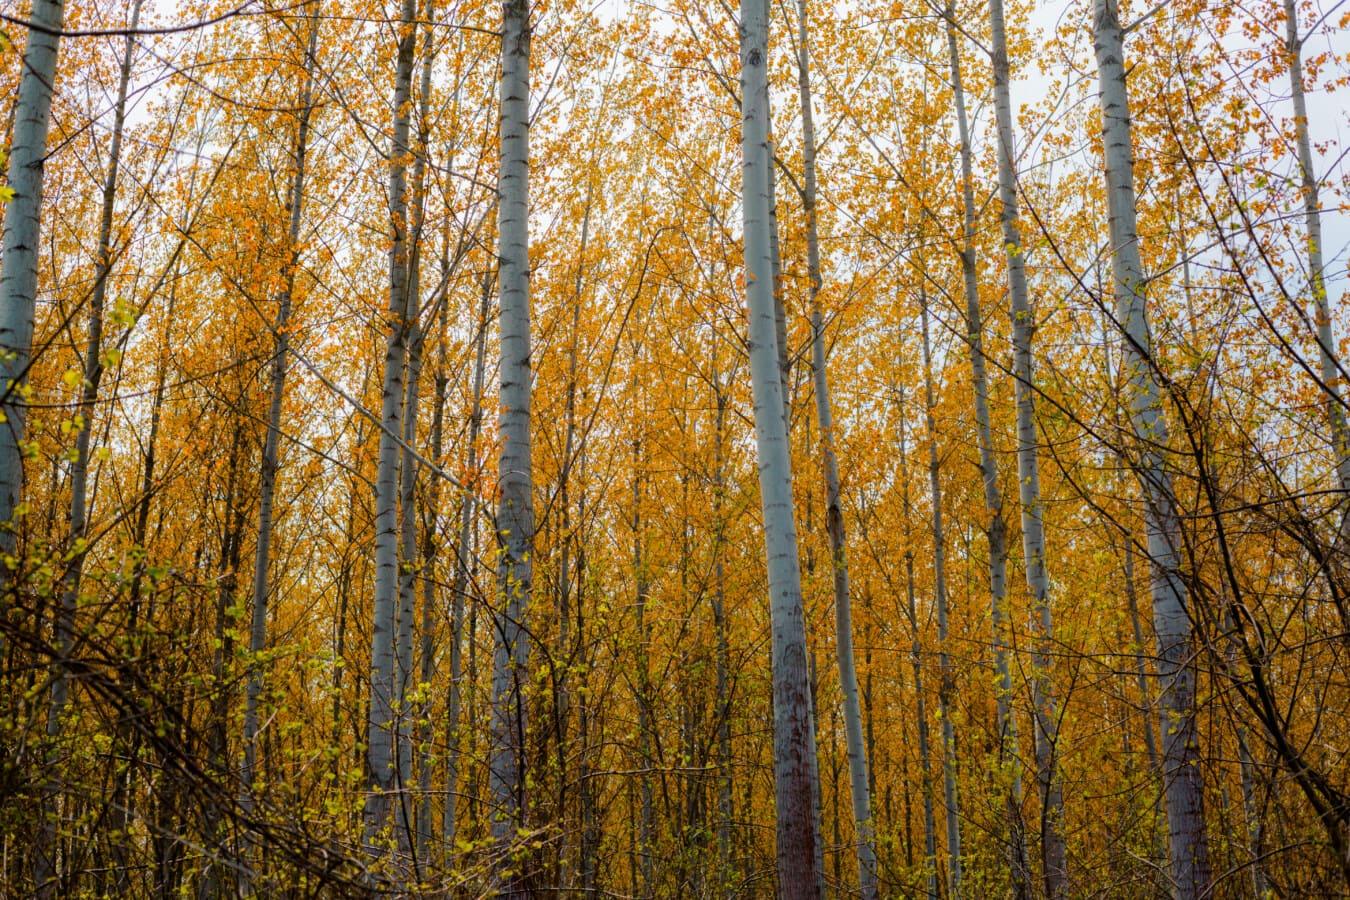 autumn season, forest, poplar, tall, trees, wood, landscape, autumn, leaf, tree